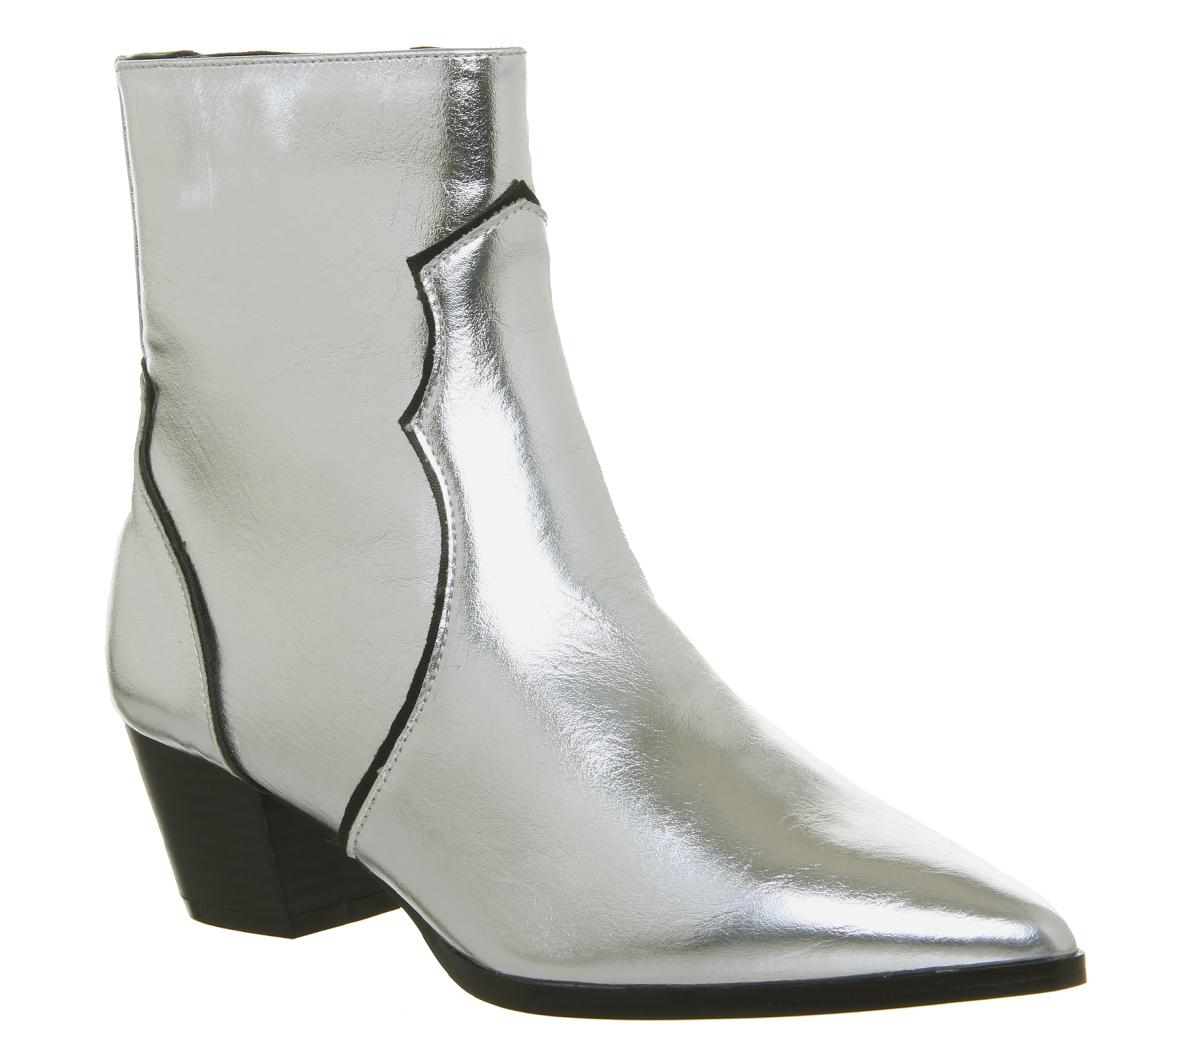 Damenschuhe Office Arlo Western Stiefel Stiefel Western SILVER Stiefel 48e1c3